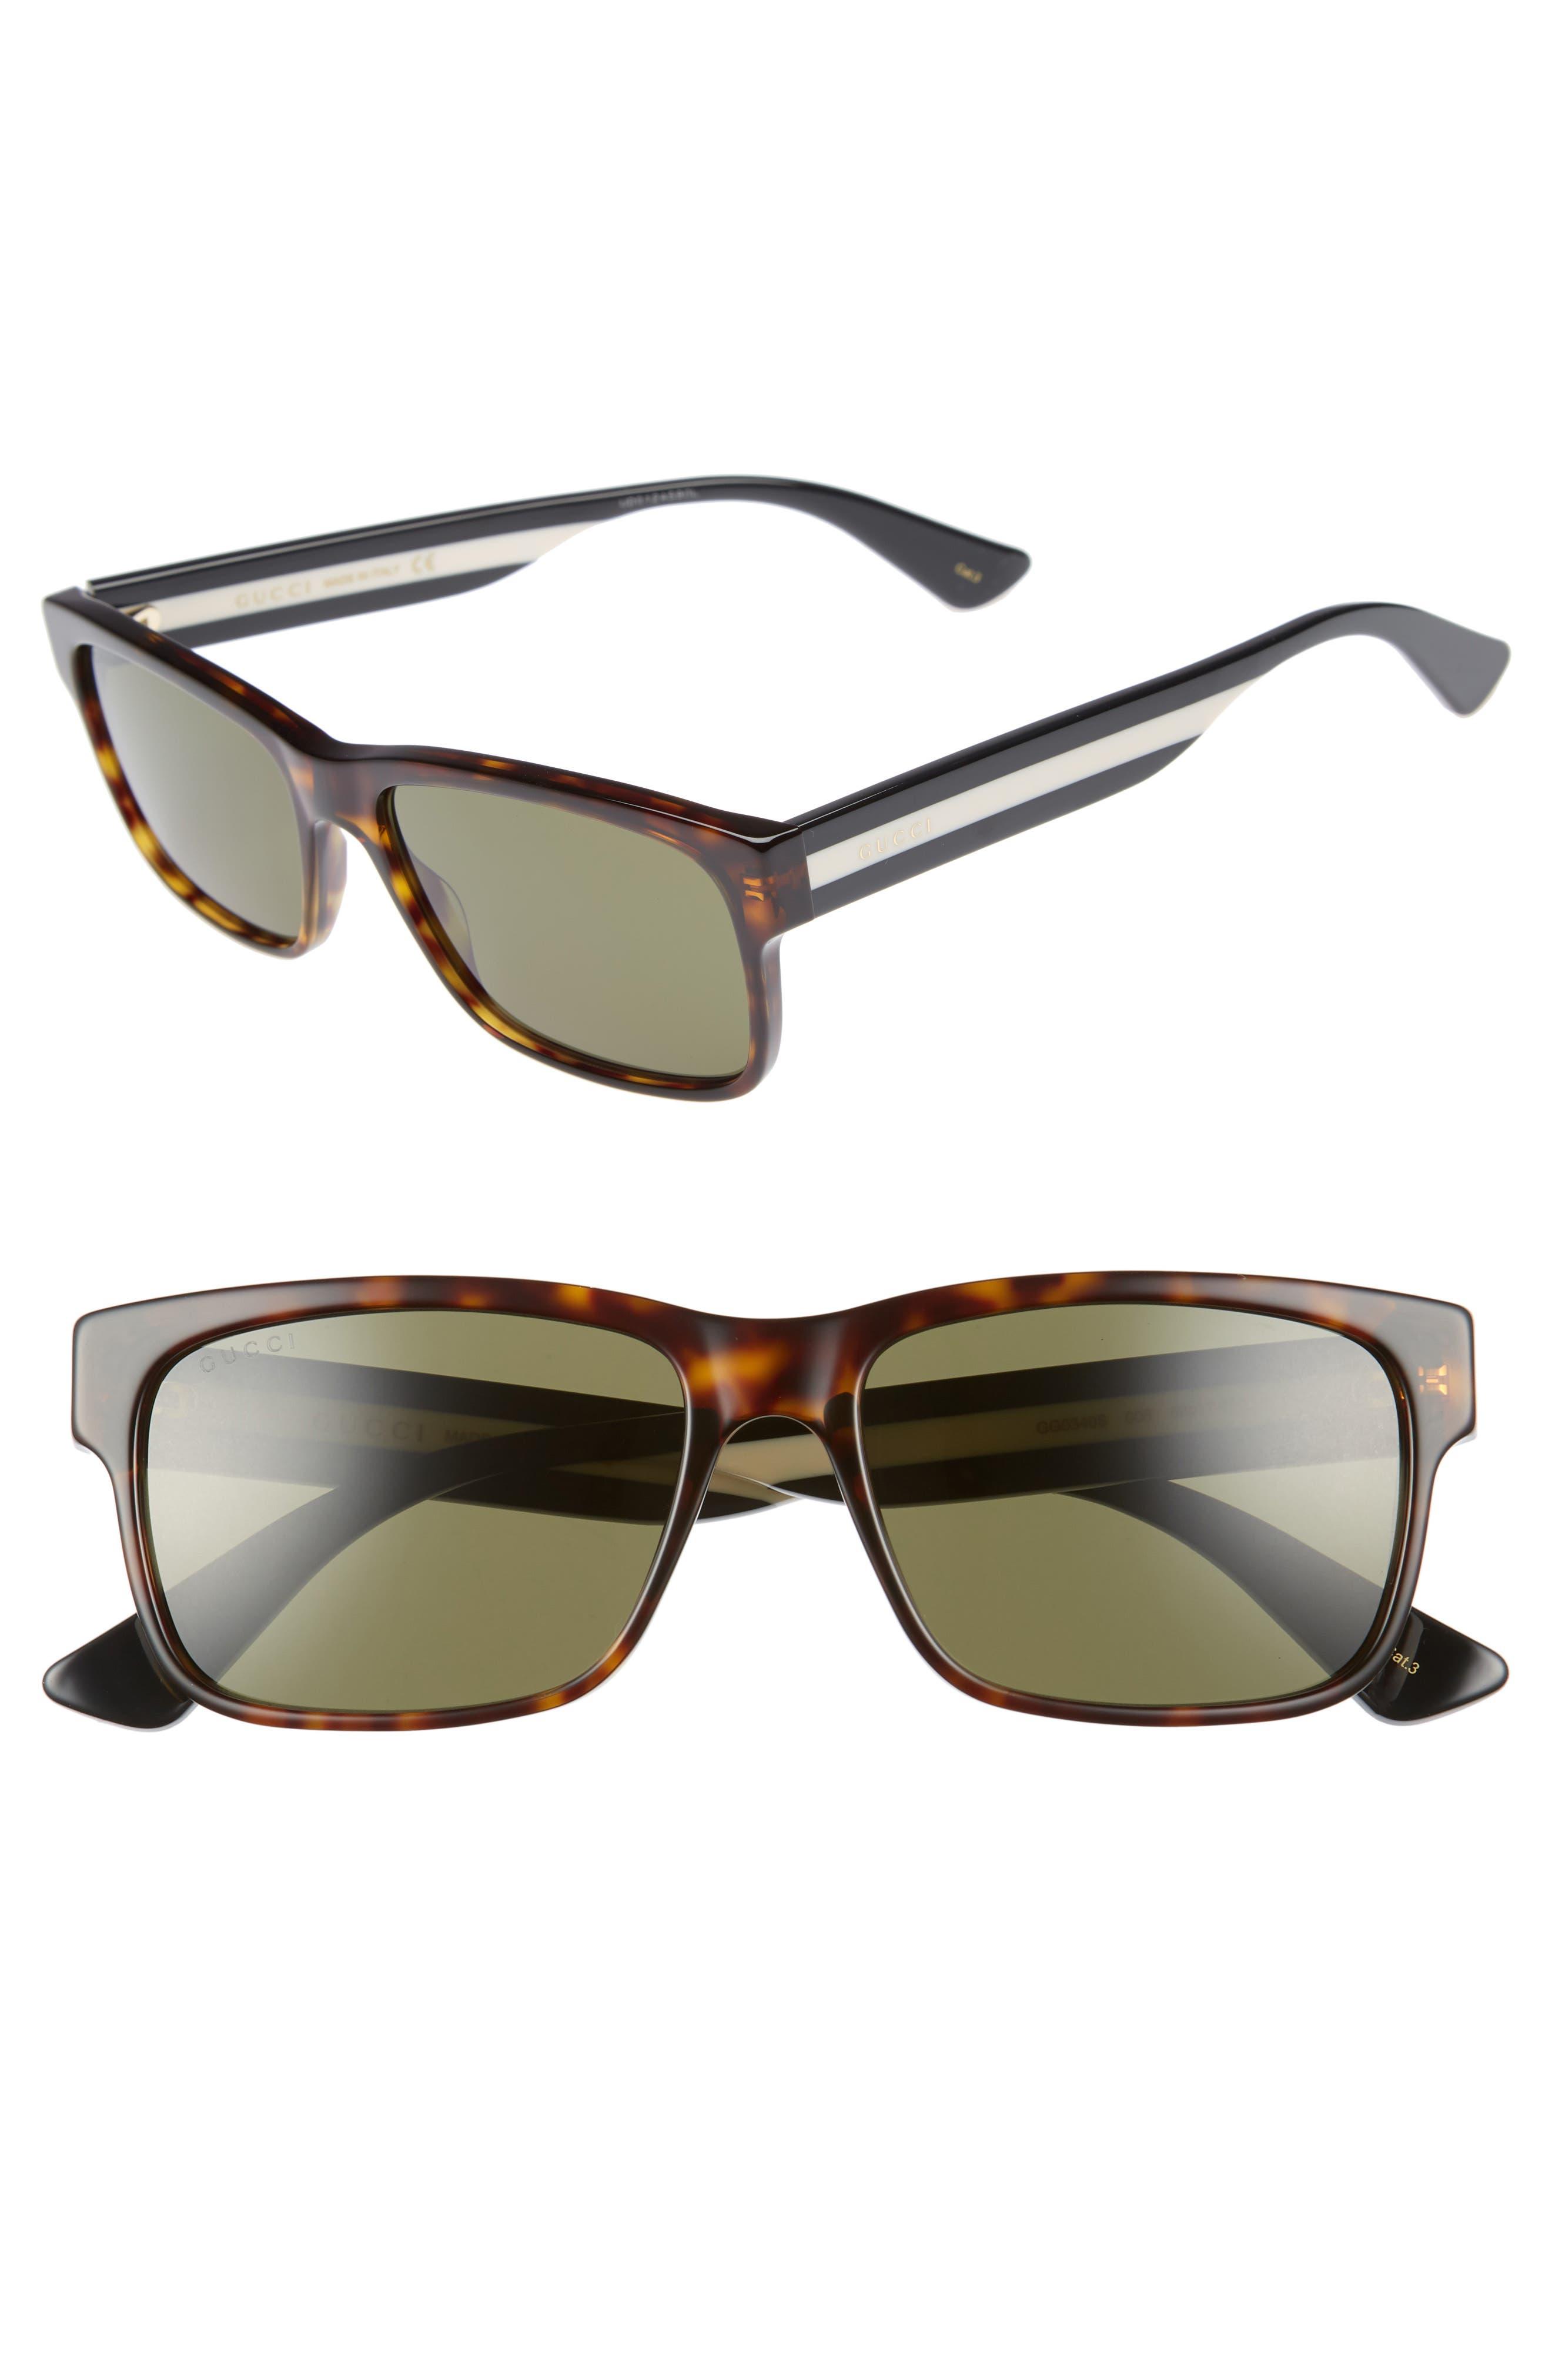 GUCCI, Sylvie 58mm Sunglasses, Main thumbnail 1, color, BLACK MULTICOLOR